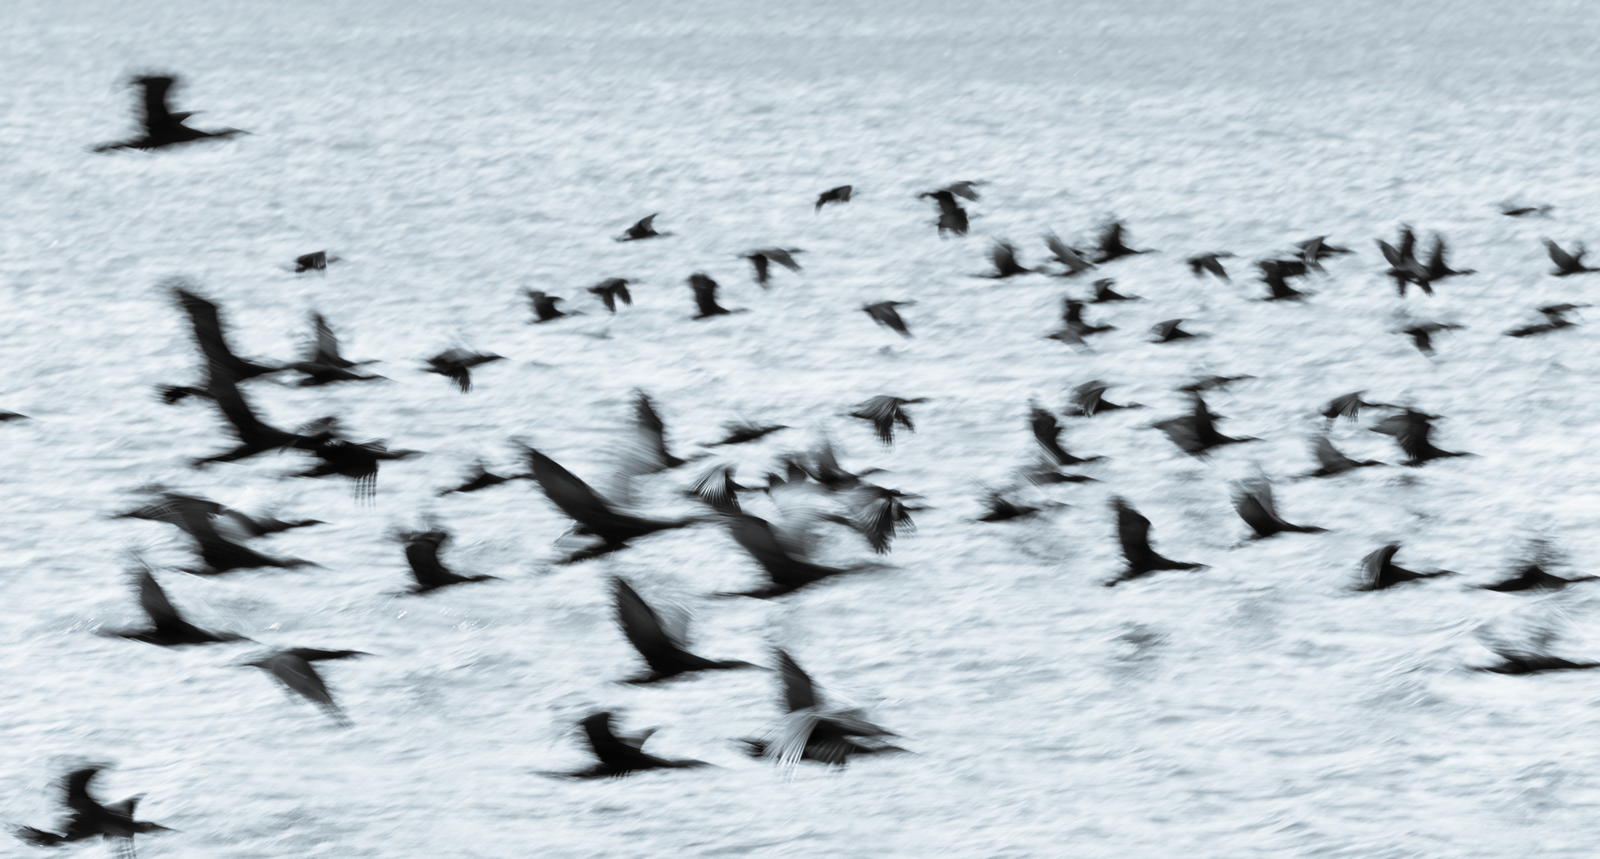 blurred image of flock of birds flying away